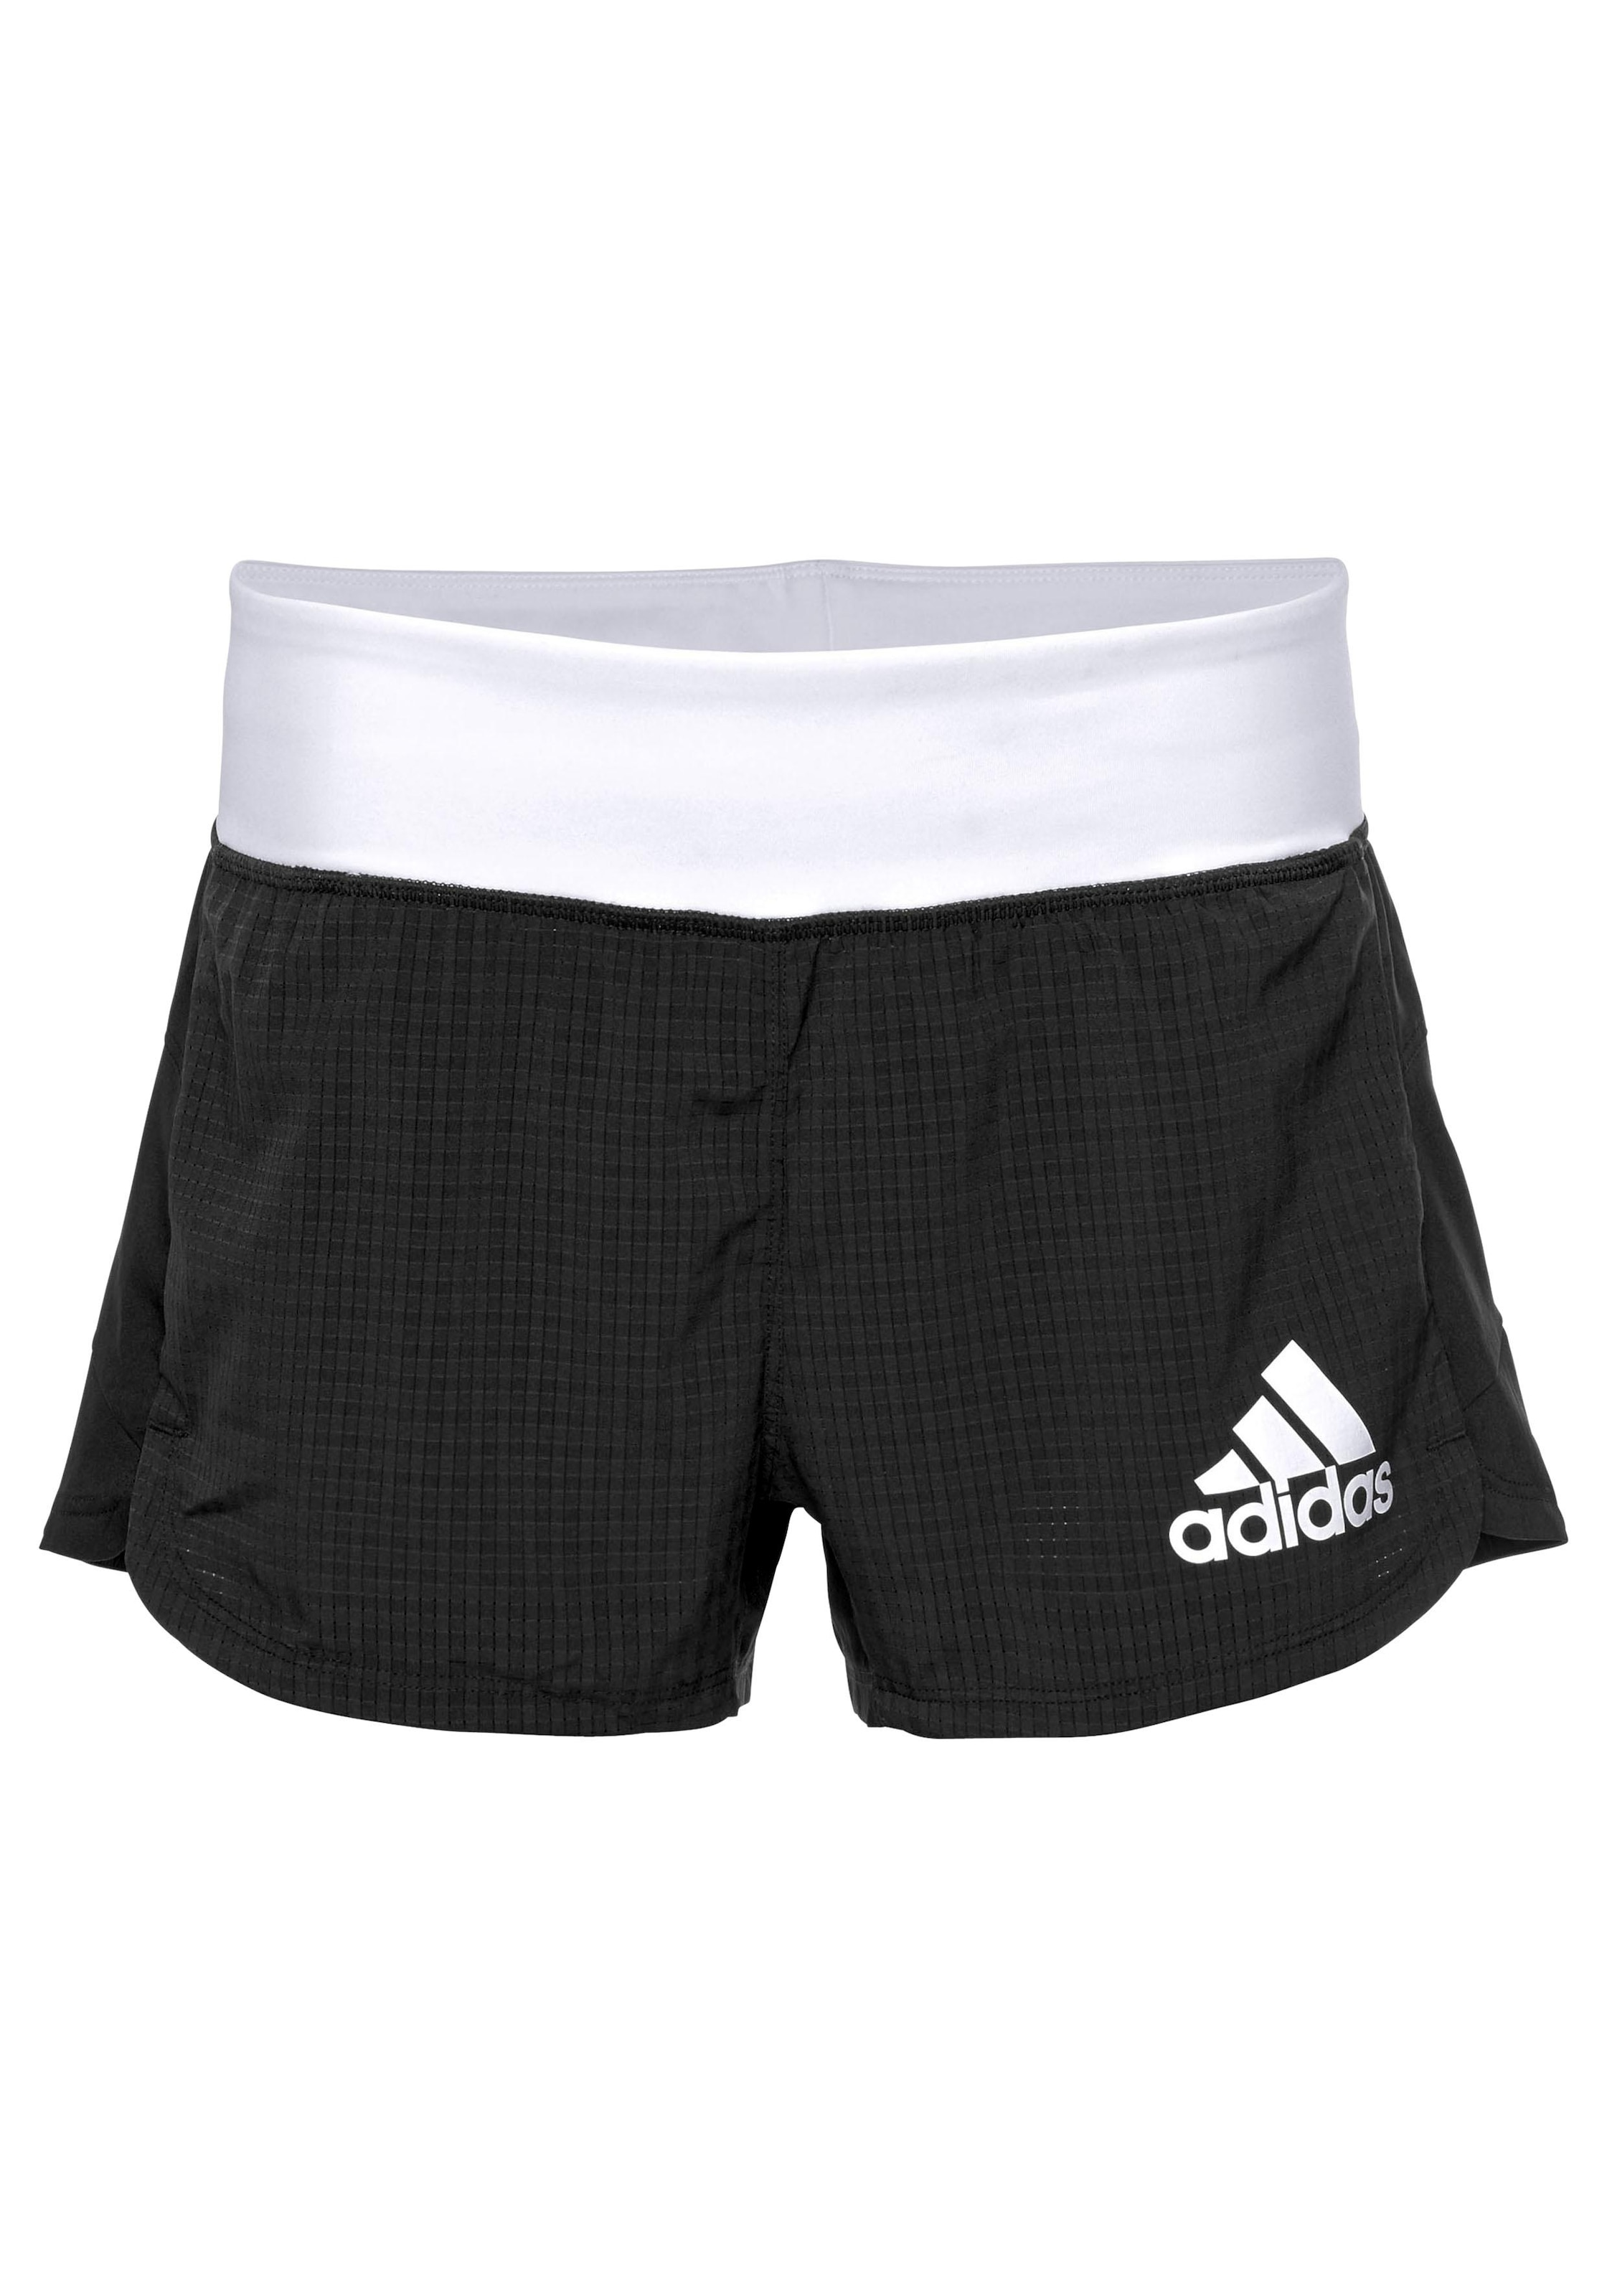 adidas Performance 2 in 1 Shorts »2IN1 SHORT NOV«